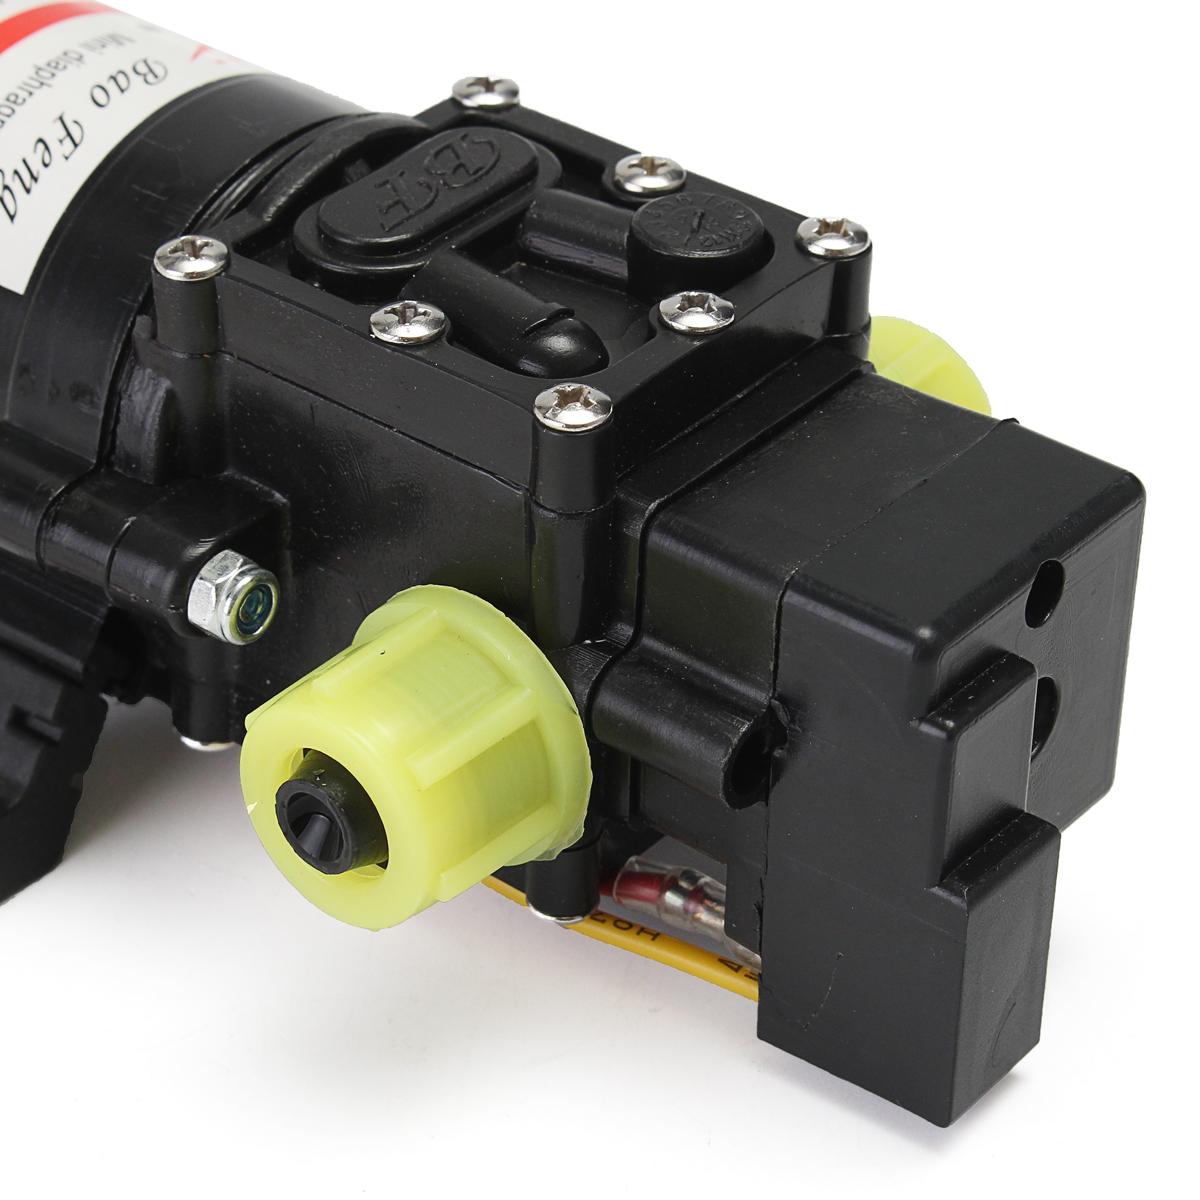 12V Water Pressure Pump Self-Priming Diaphragm Caravan/RV/Boat/Marine Boat